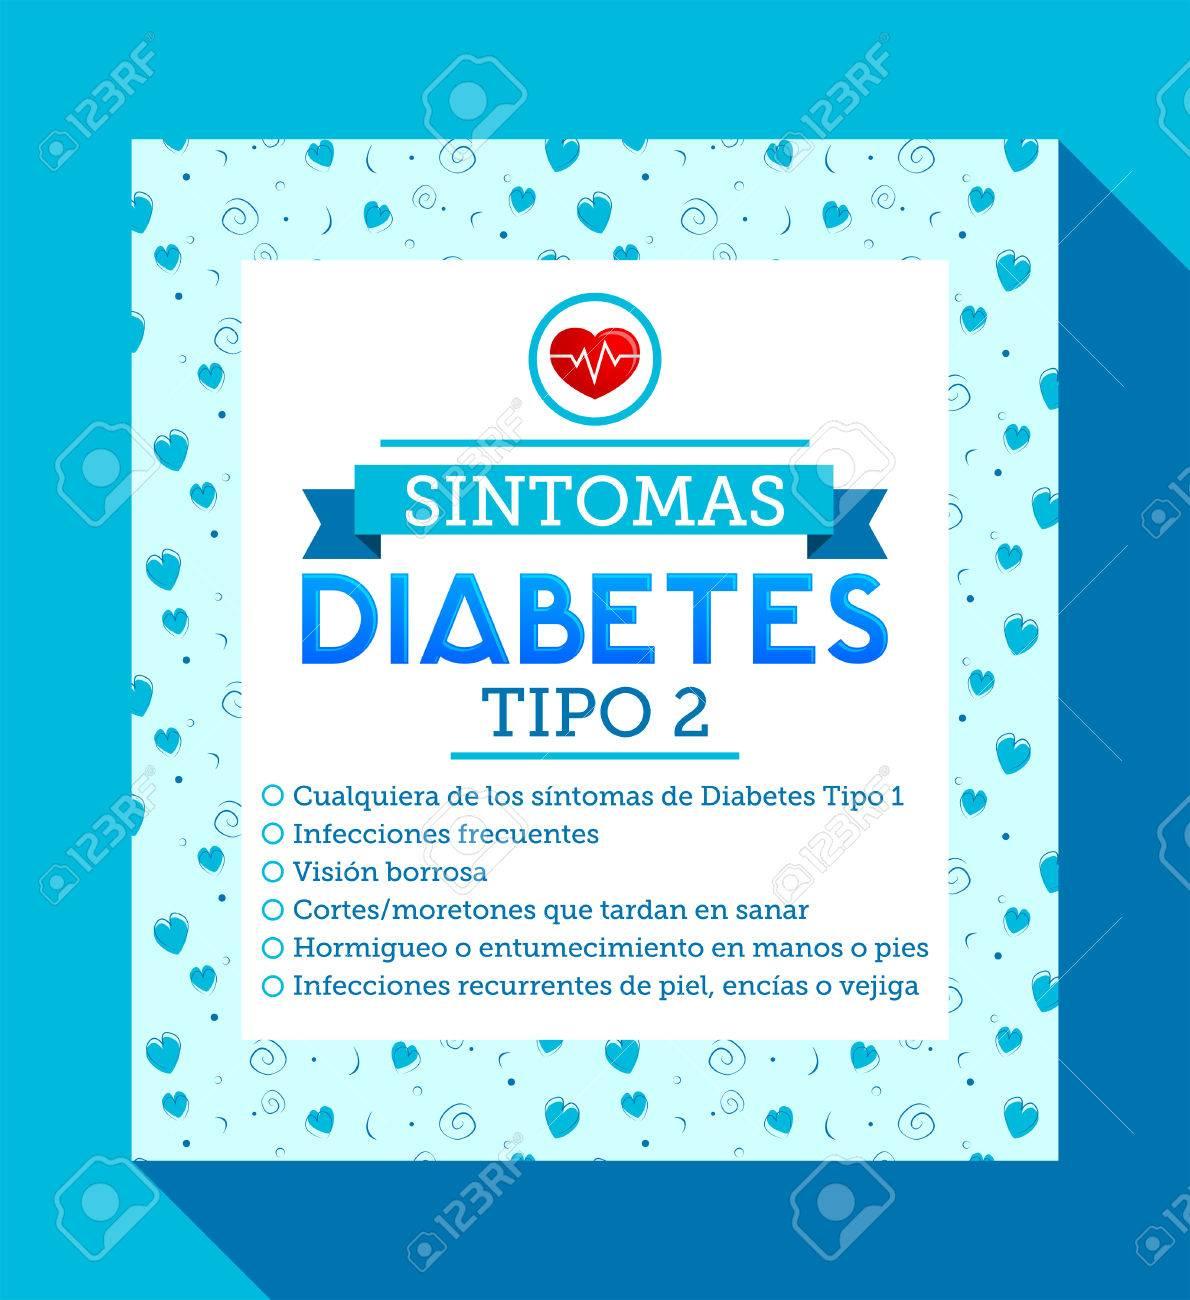 diabetes de piperrak kualkier diabetes